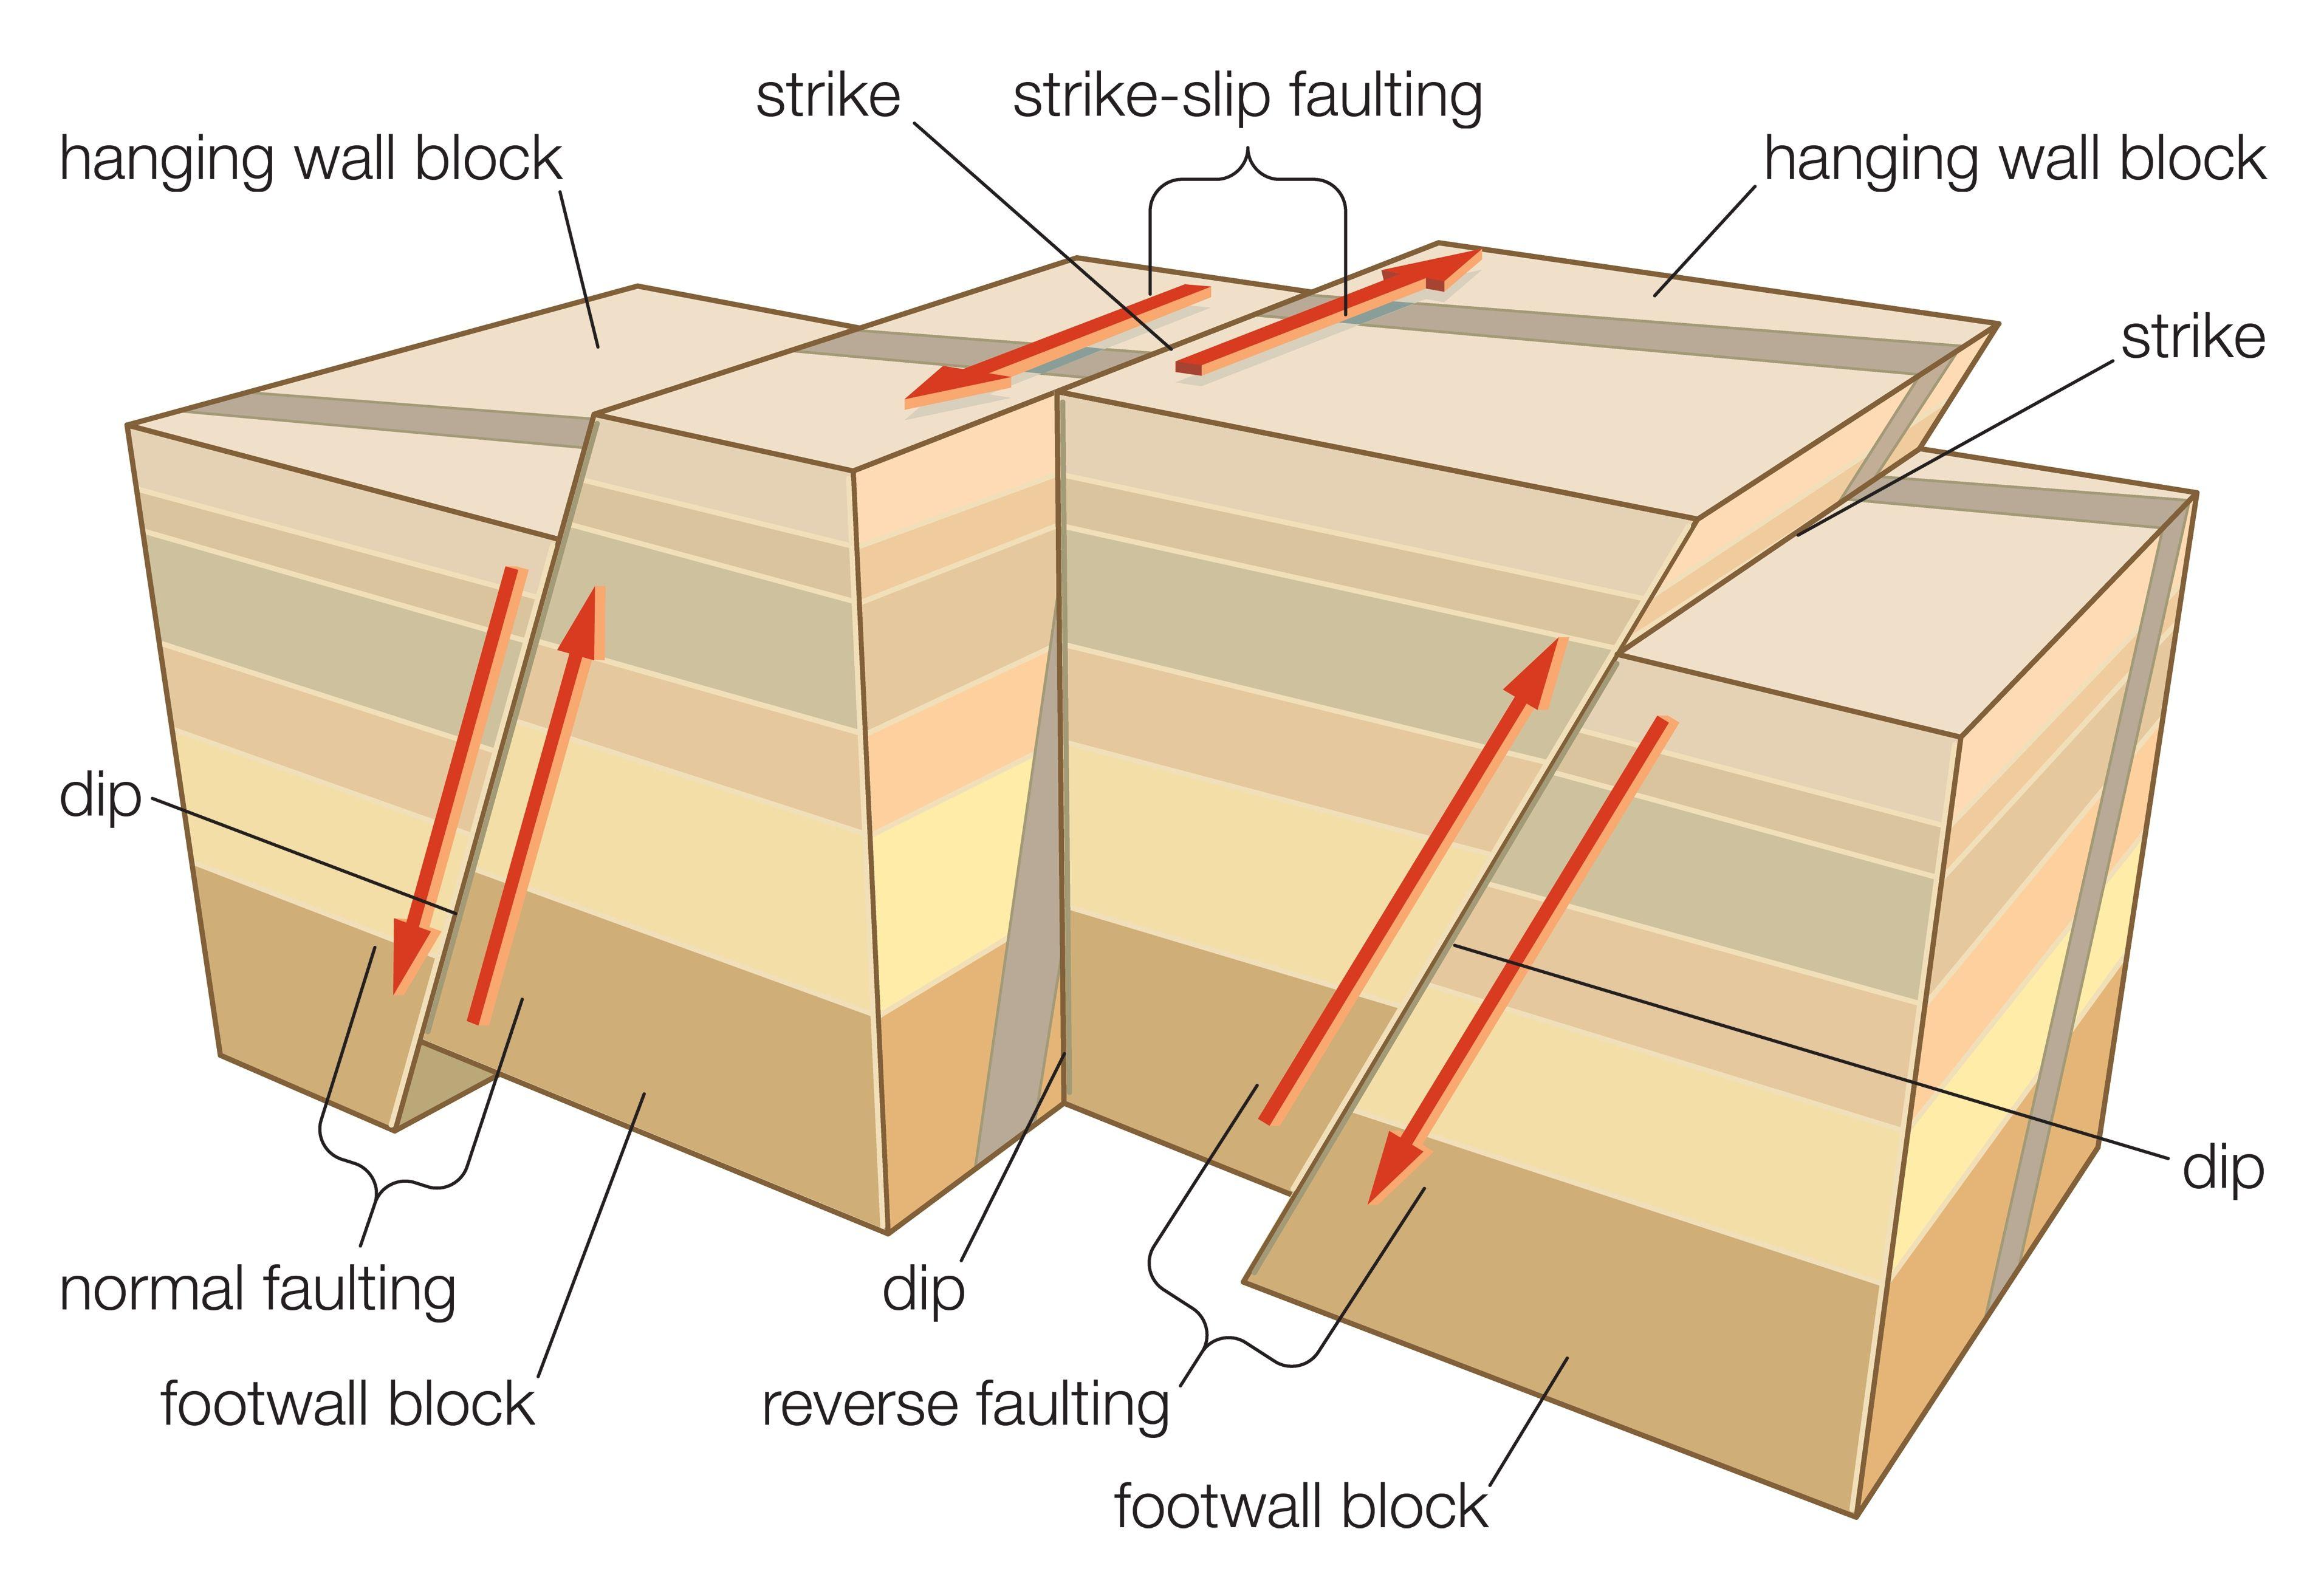 strike slip fault block diagram john deere 316 wiring pdf learn about different types